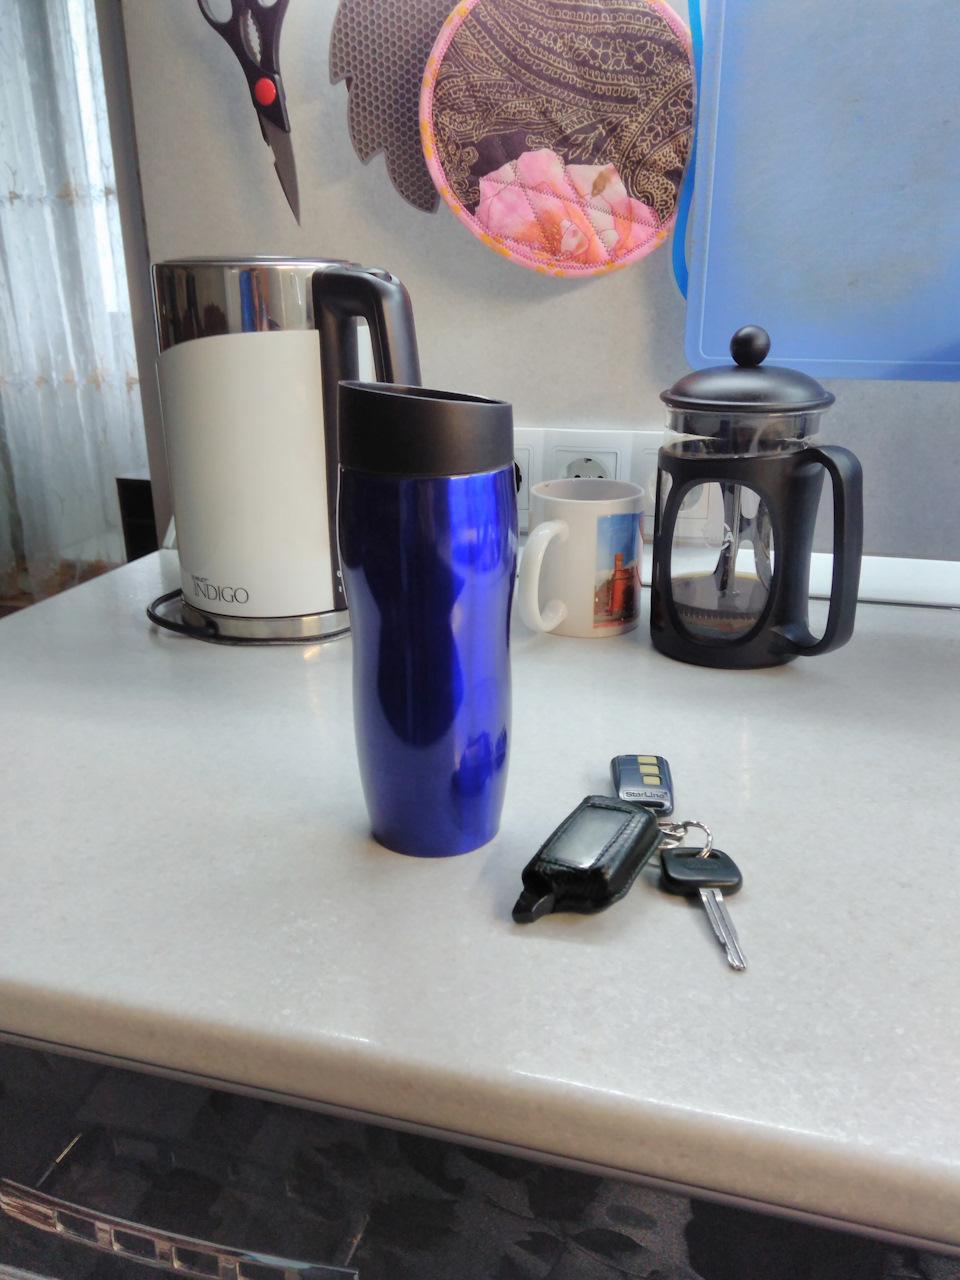 3e7f089s 960 - Что такое стакан в автомобиле